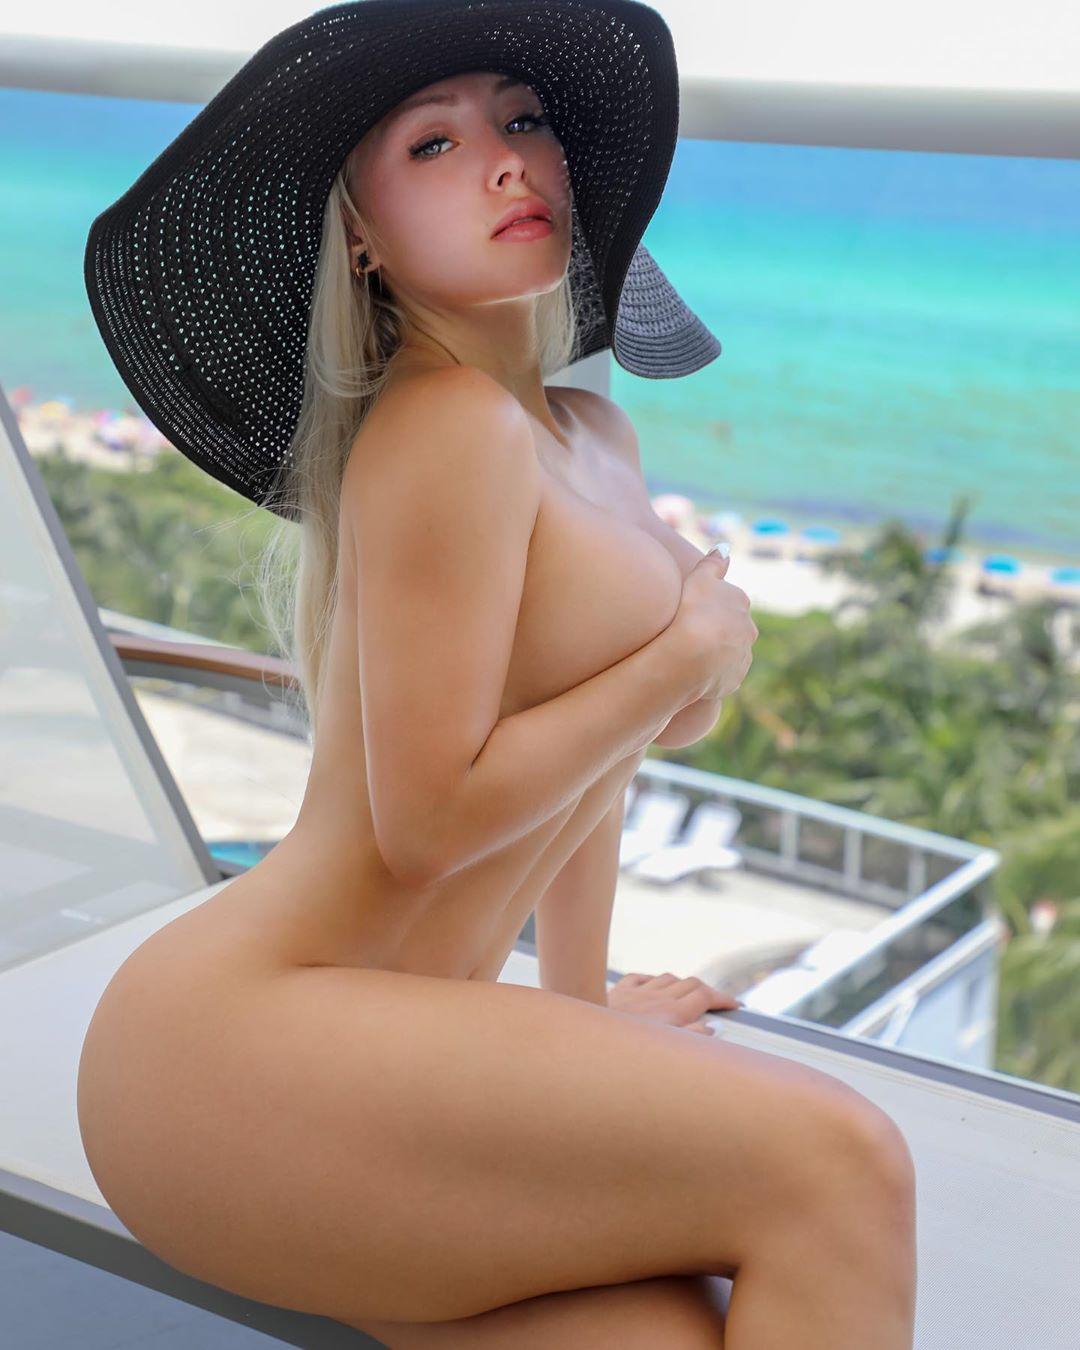 https://images2.imgbox.com/53/a4/Be8ubuiH_o.jpg